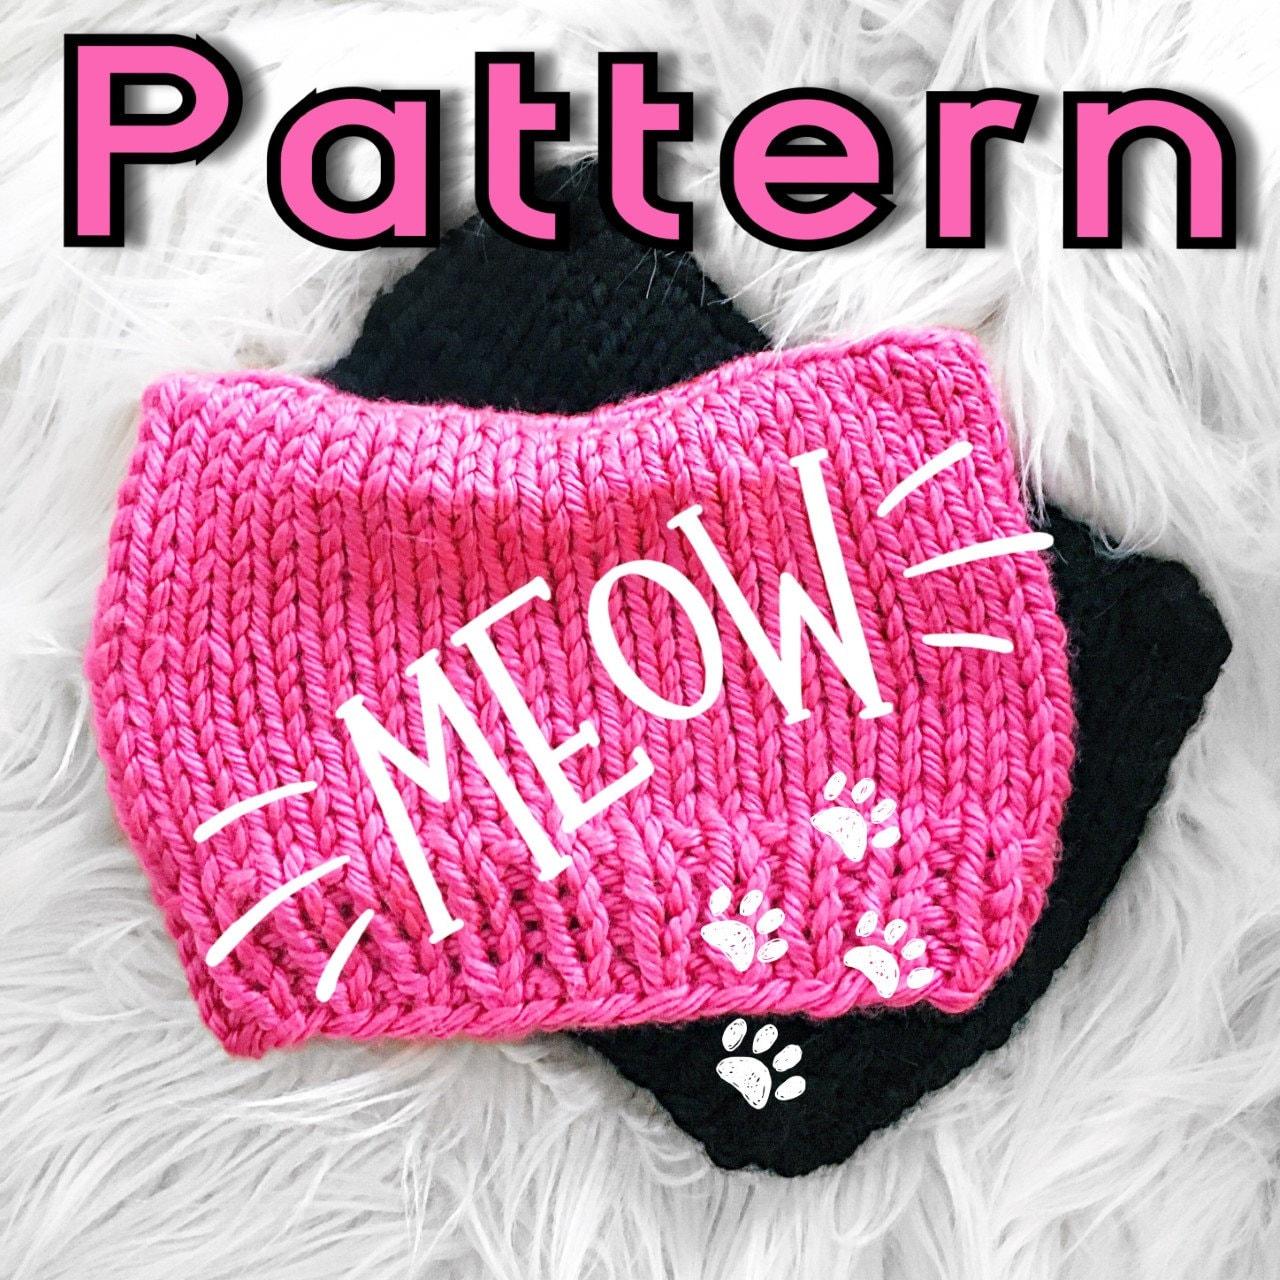 Knitting pattern cat beanie pattern cat hat pattern easy knit knitting pattern cat beanie pattern cat hat pattern easy knit pattern beginner knit pattern pdf easy knitting pattern tutorial dt1010fo